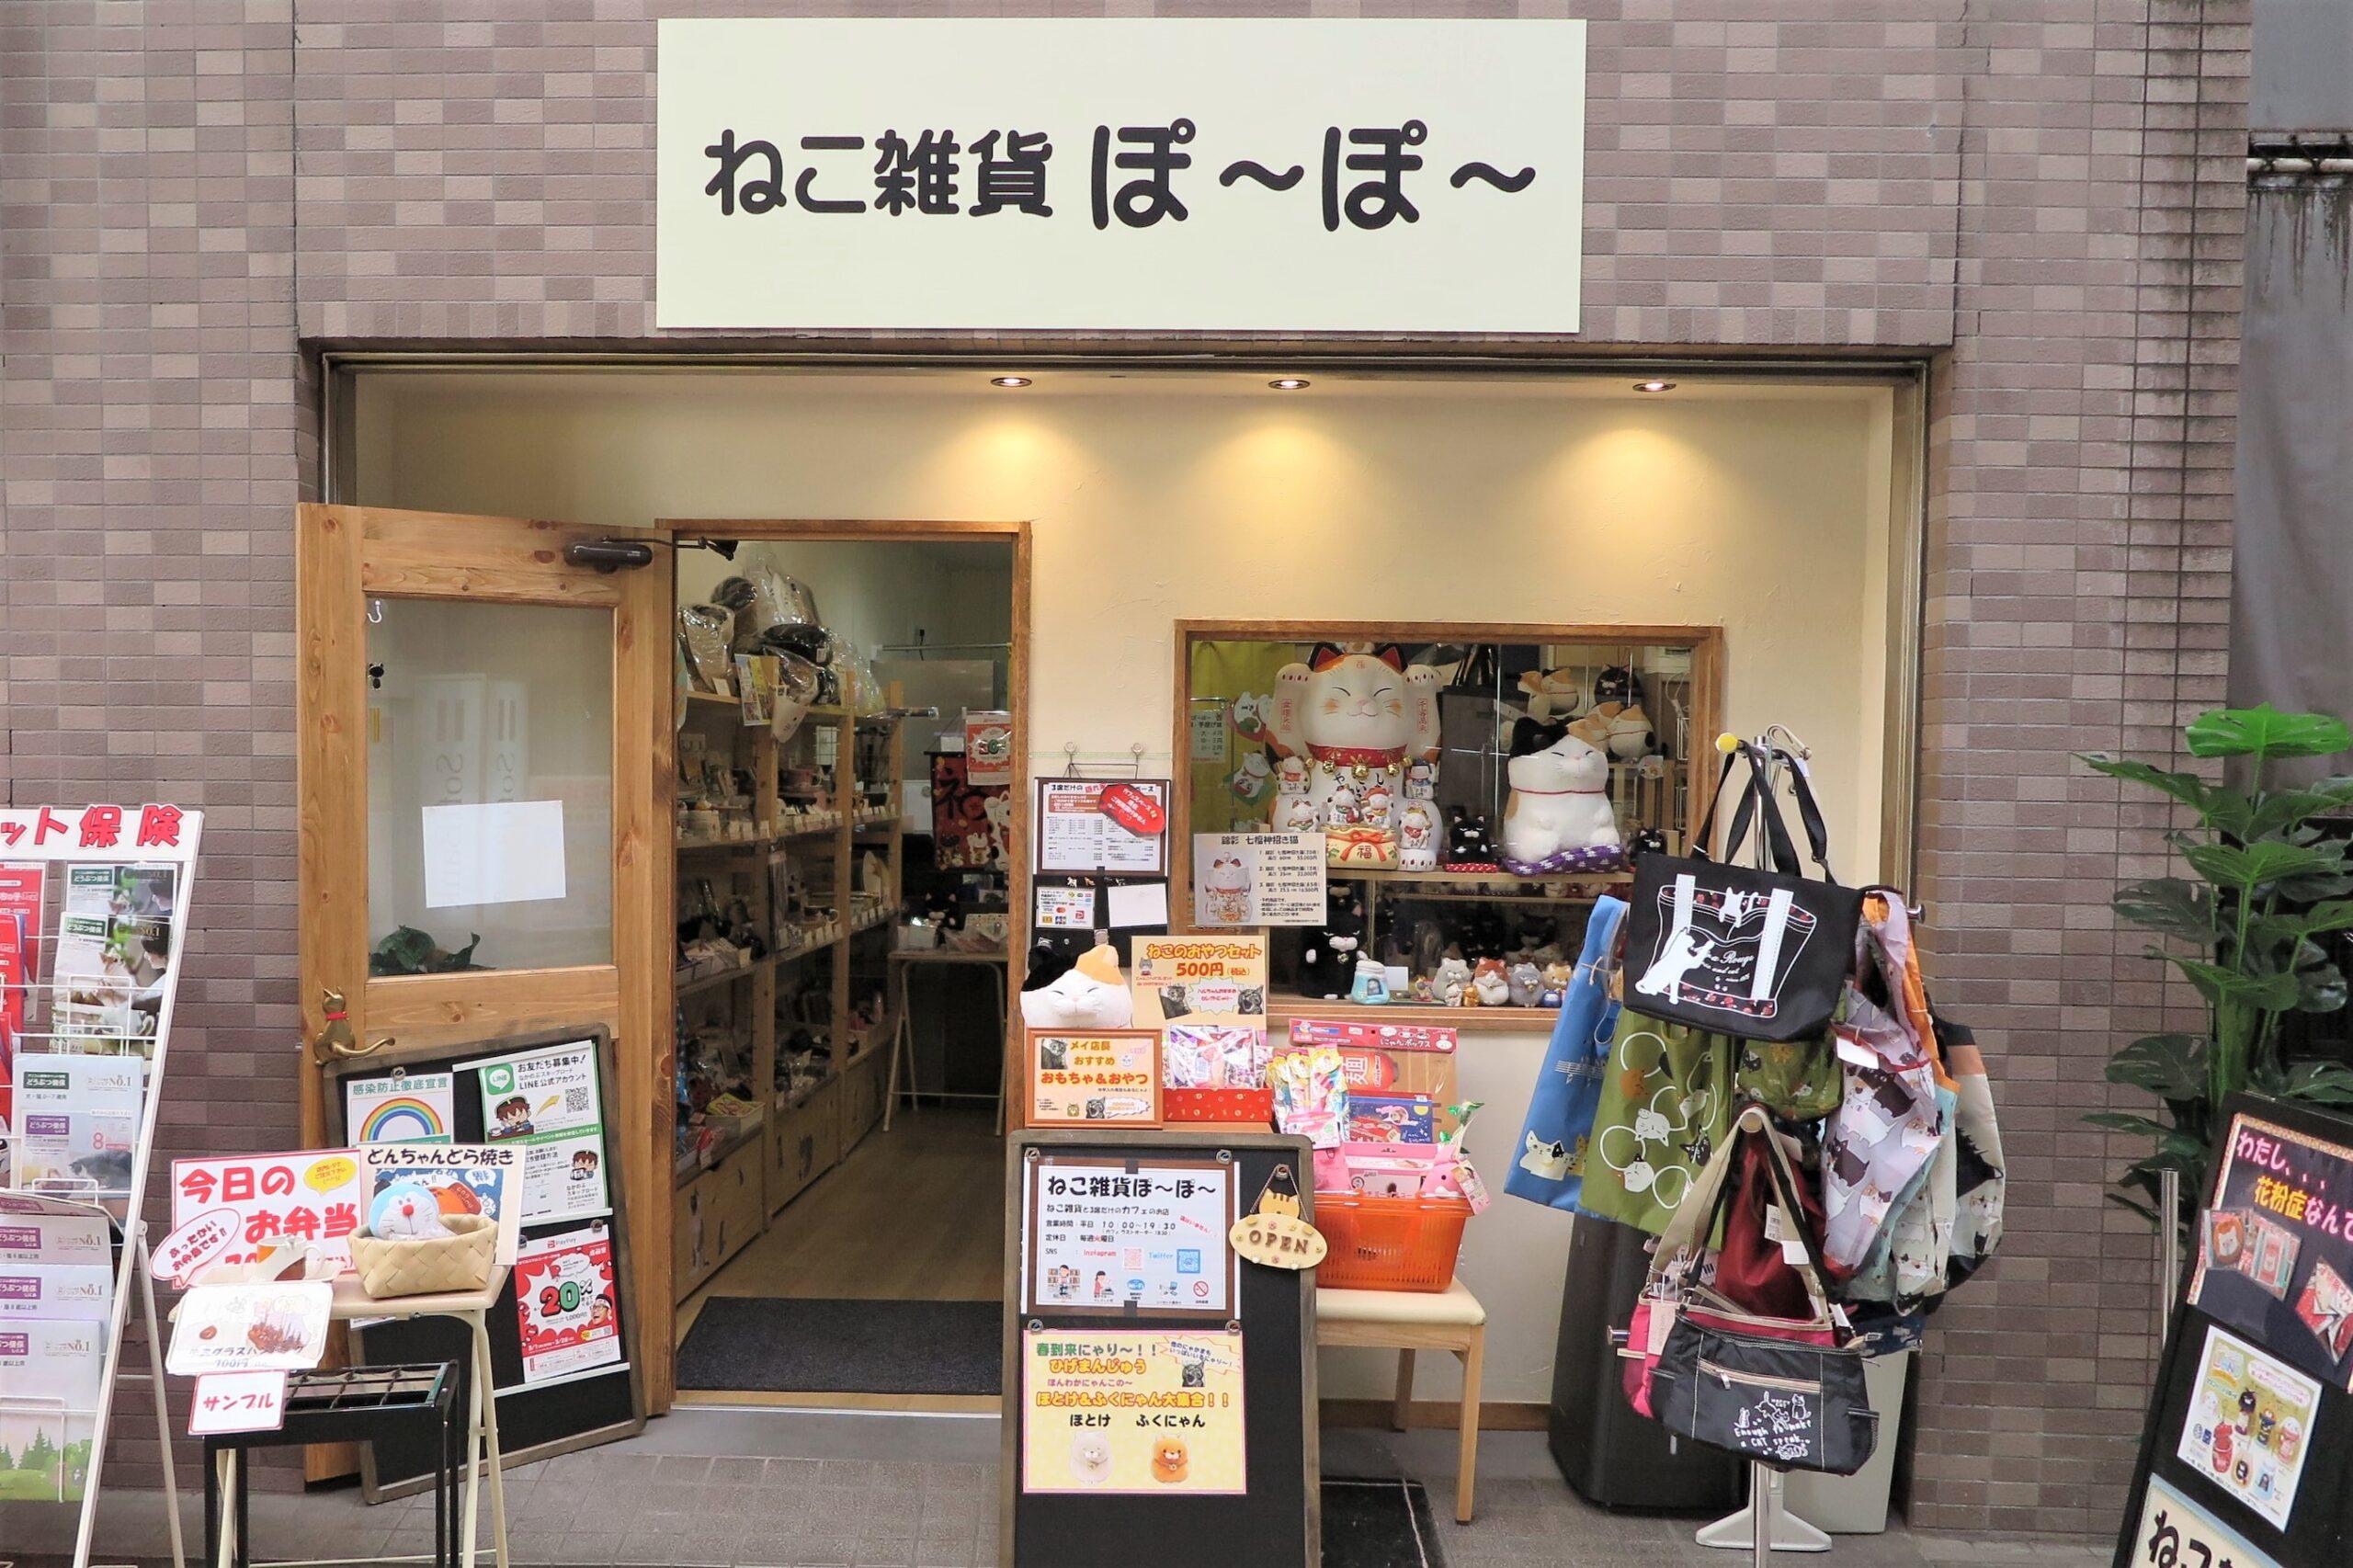 https://nakanobu.com/wp-content/uploads/2021/04/2ce4dbdae913272a280c7c1d46f5b711-scaled.jpg